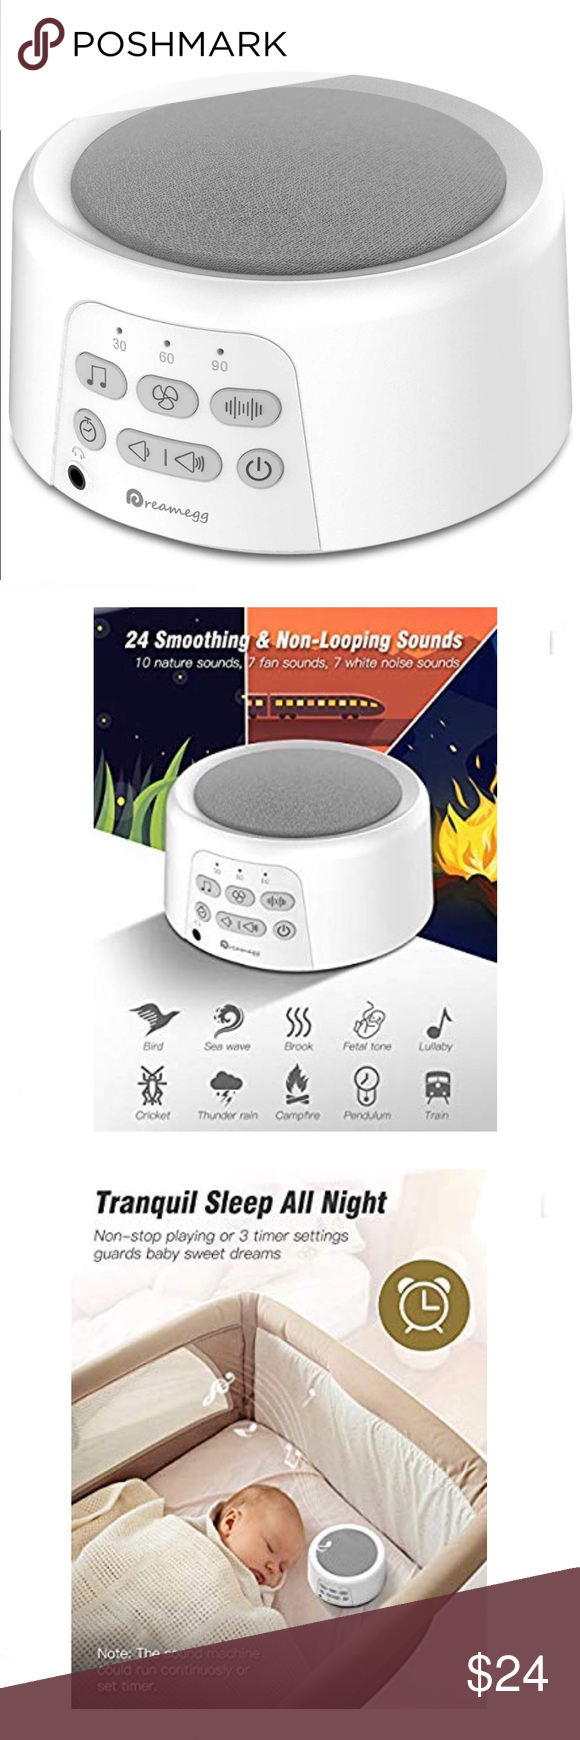 24 Timer Sound white noise sound machine, 24 non-looping sounds this sleep